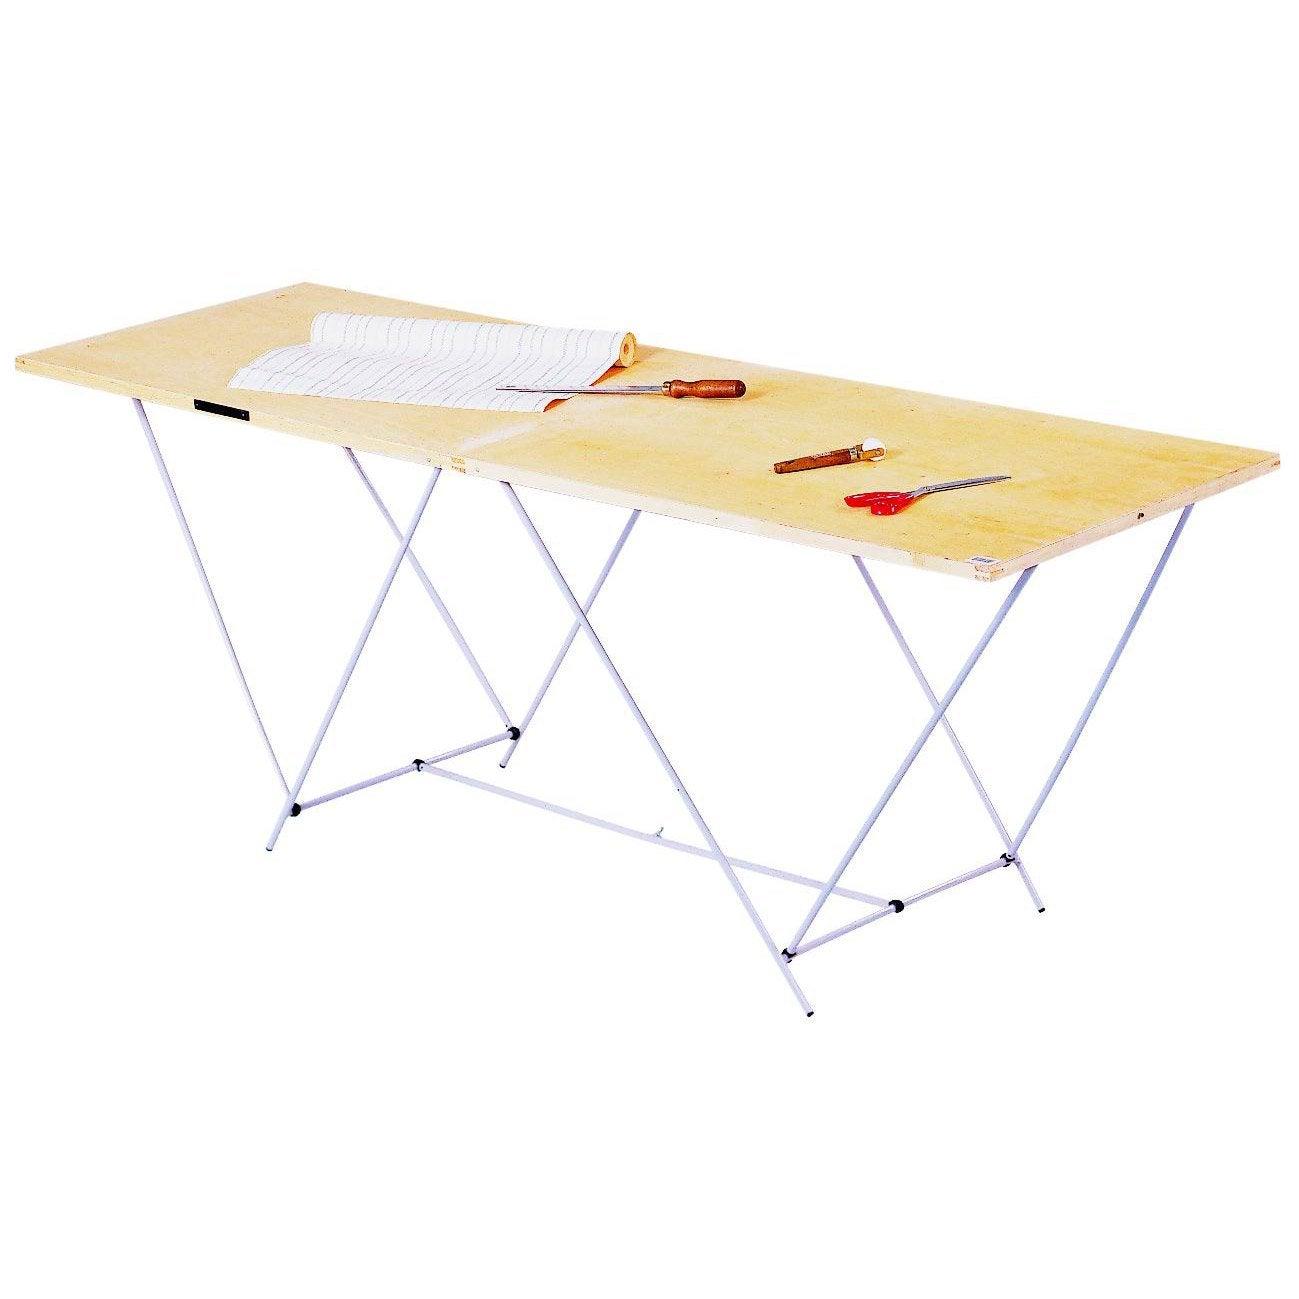 table tapisser pliante ocai 60 cm x 2 m leroy merlin. Black Bedroom Furniture Sets. Home Design Ideas